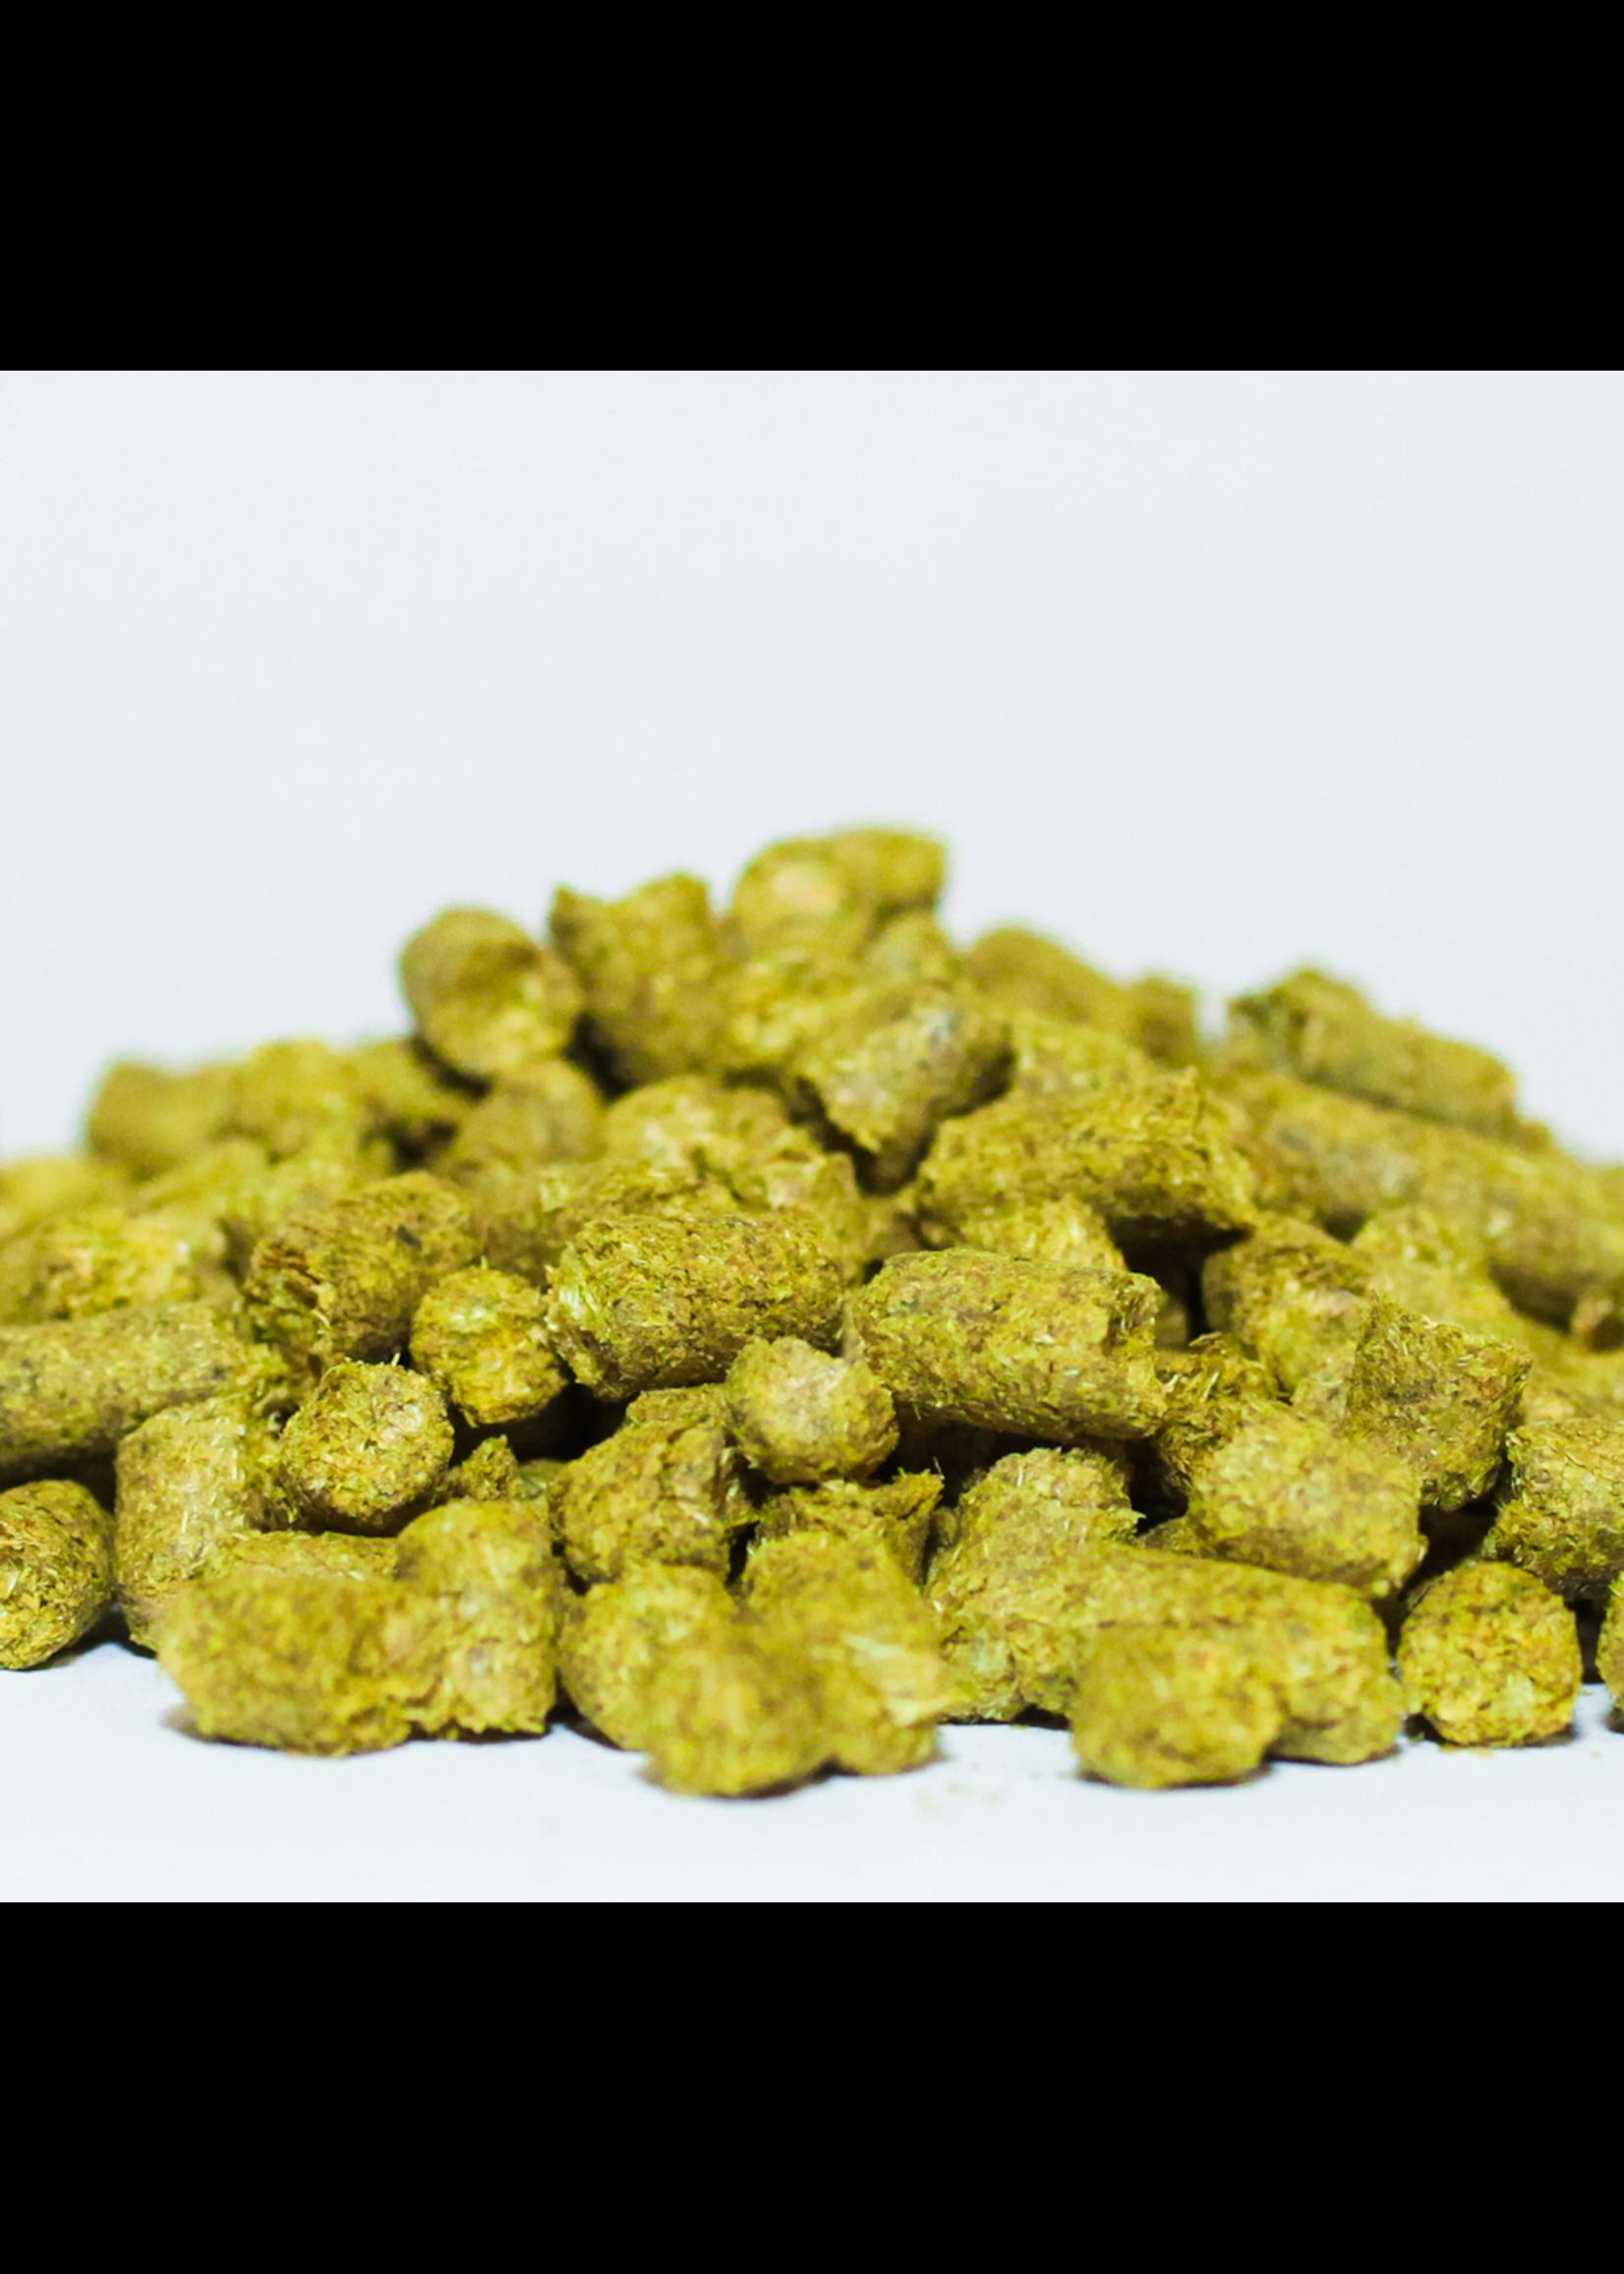 Hops Willamette Hops (US) - Pellets - 1 oz